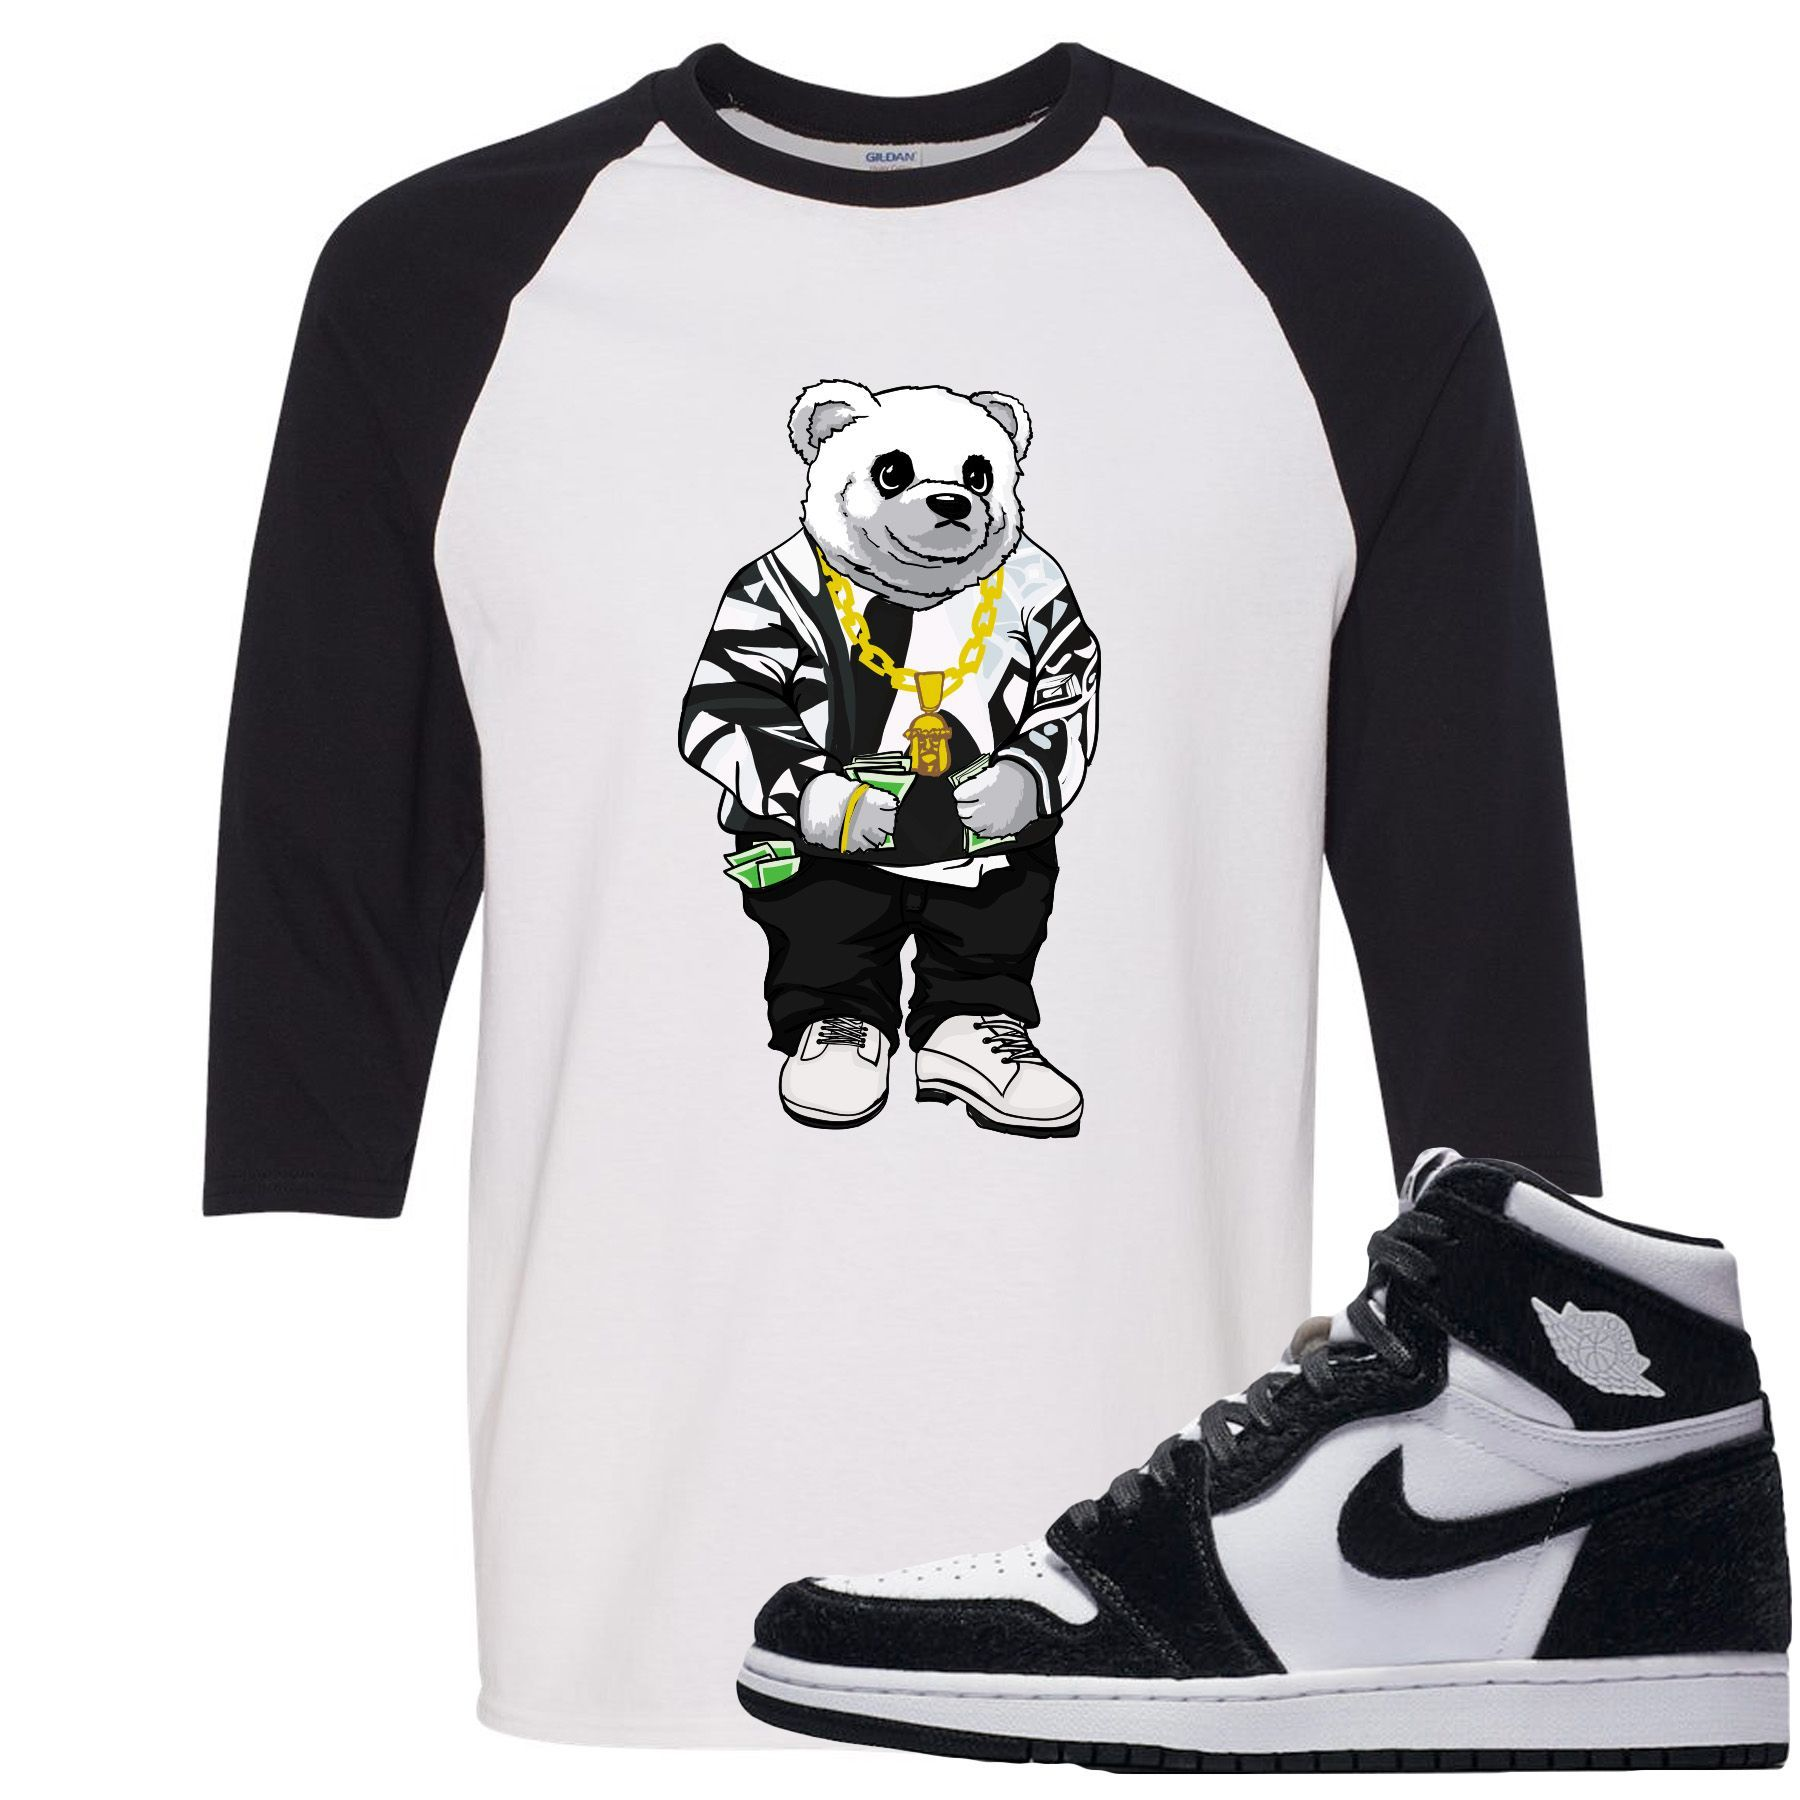 Jordan 1 Retro High OG WMNS Panda Sneaker Hook Up Sweater